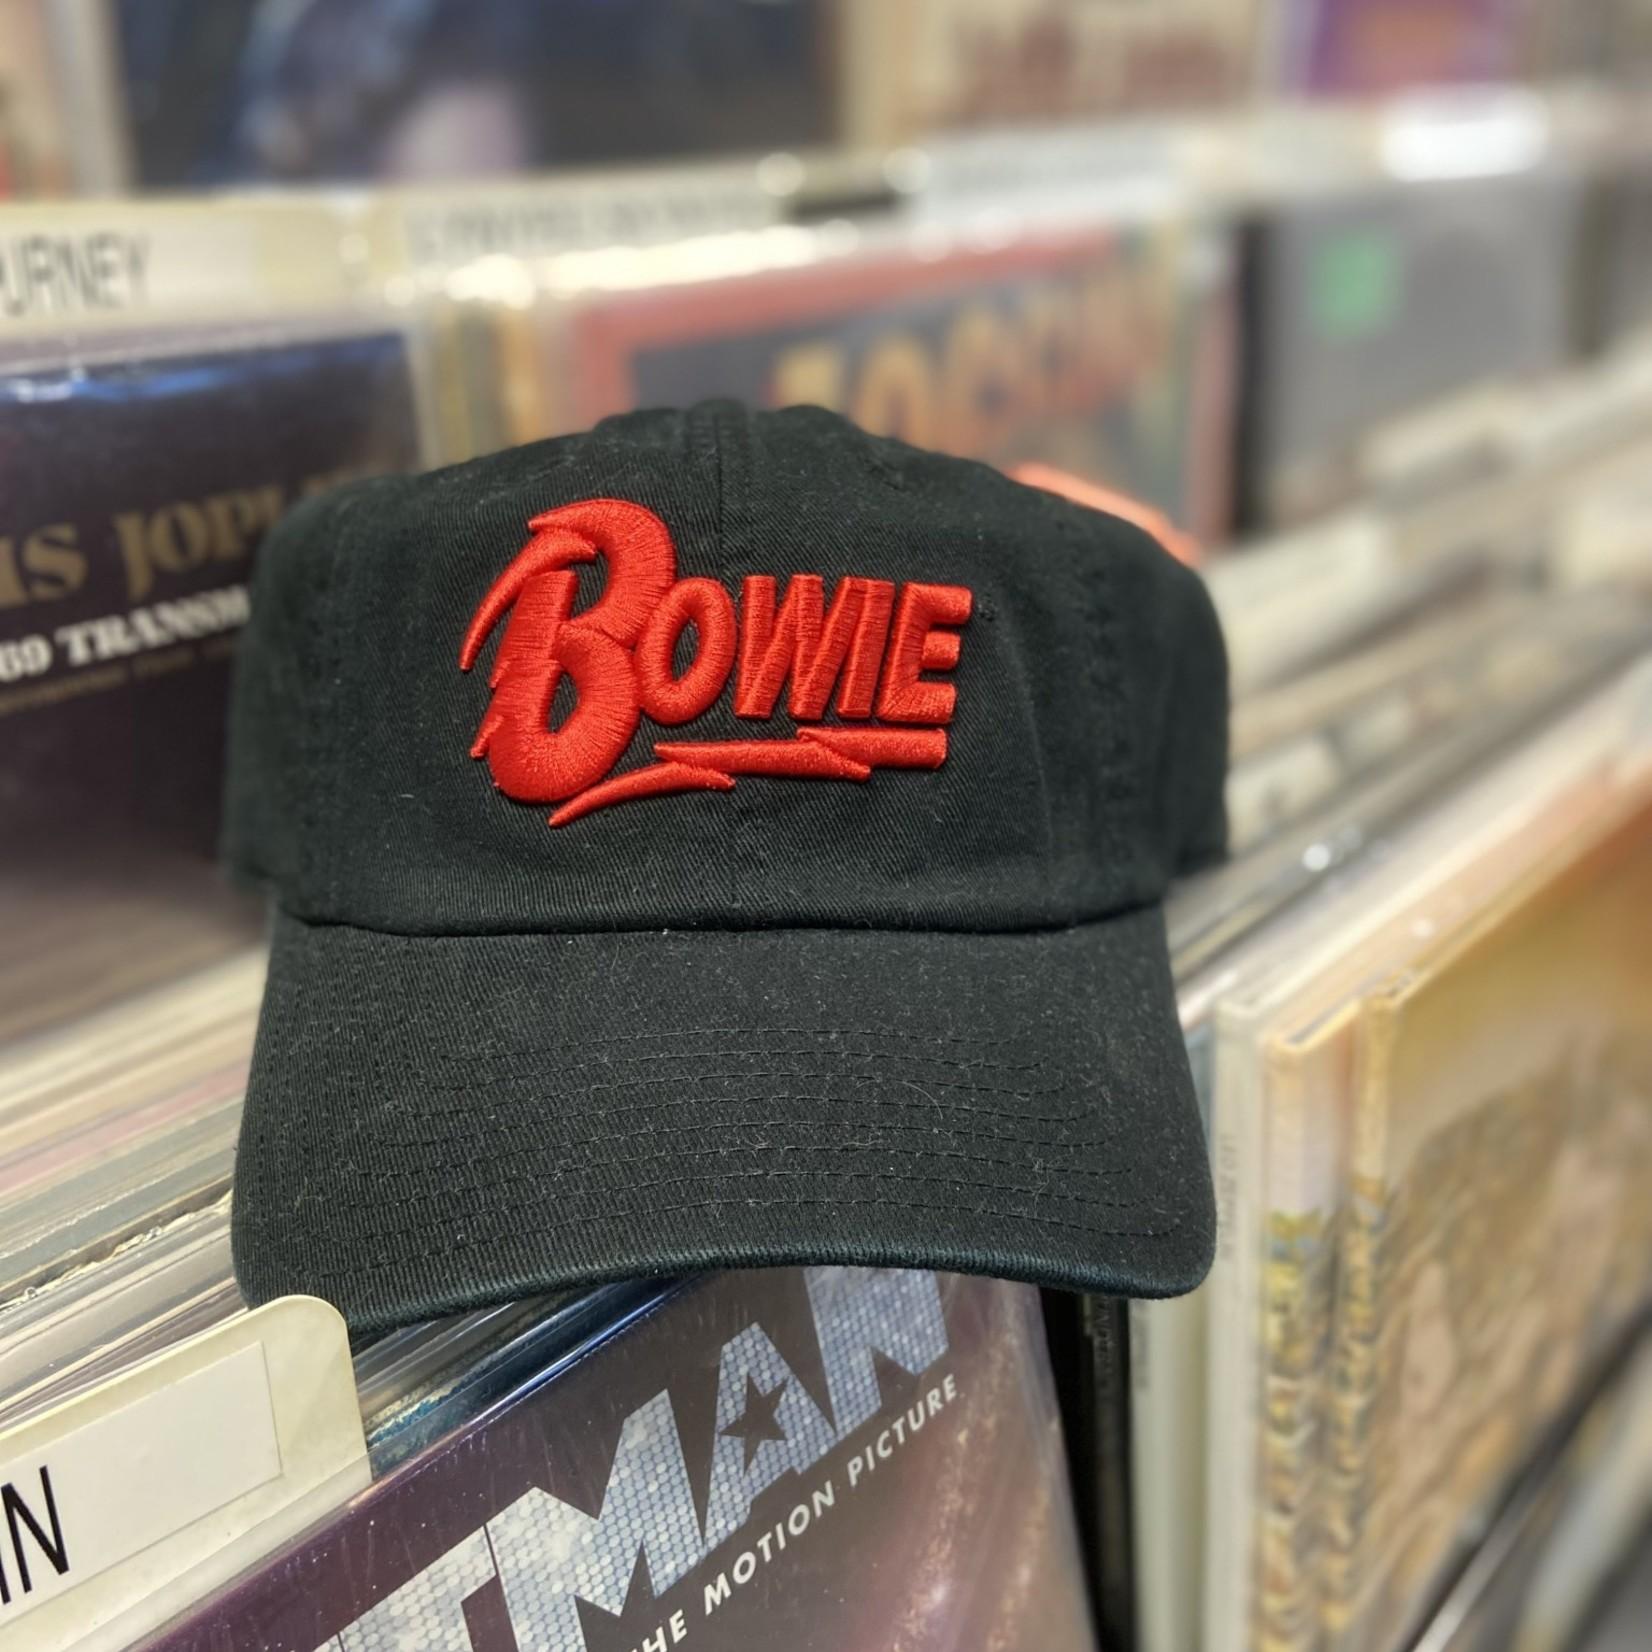 American Needle Bowie Ballpark Hat